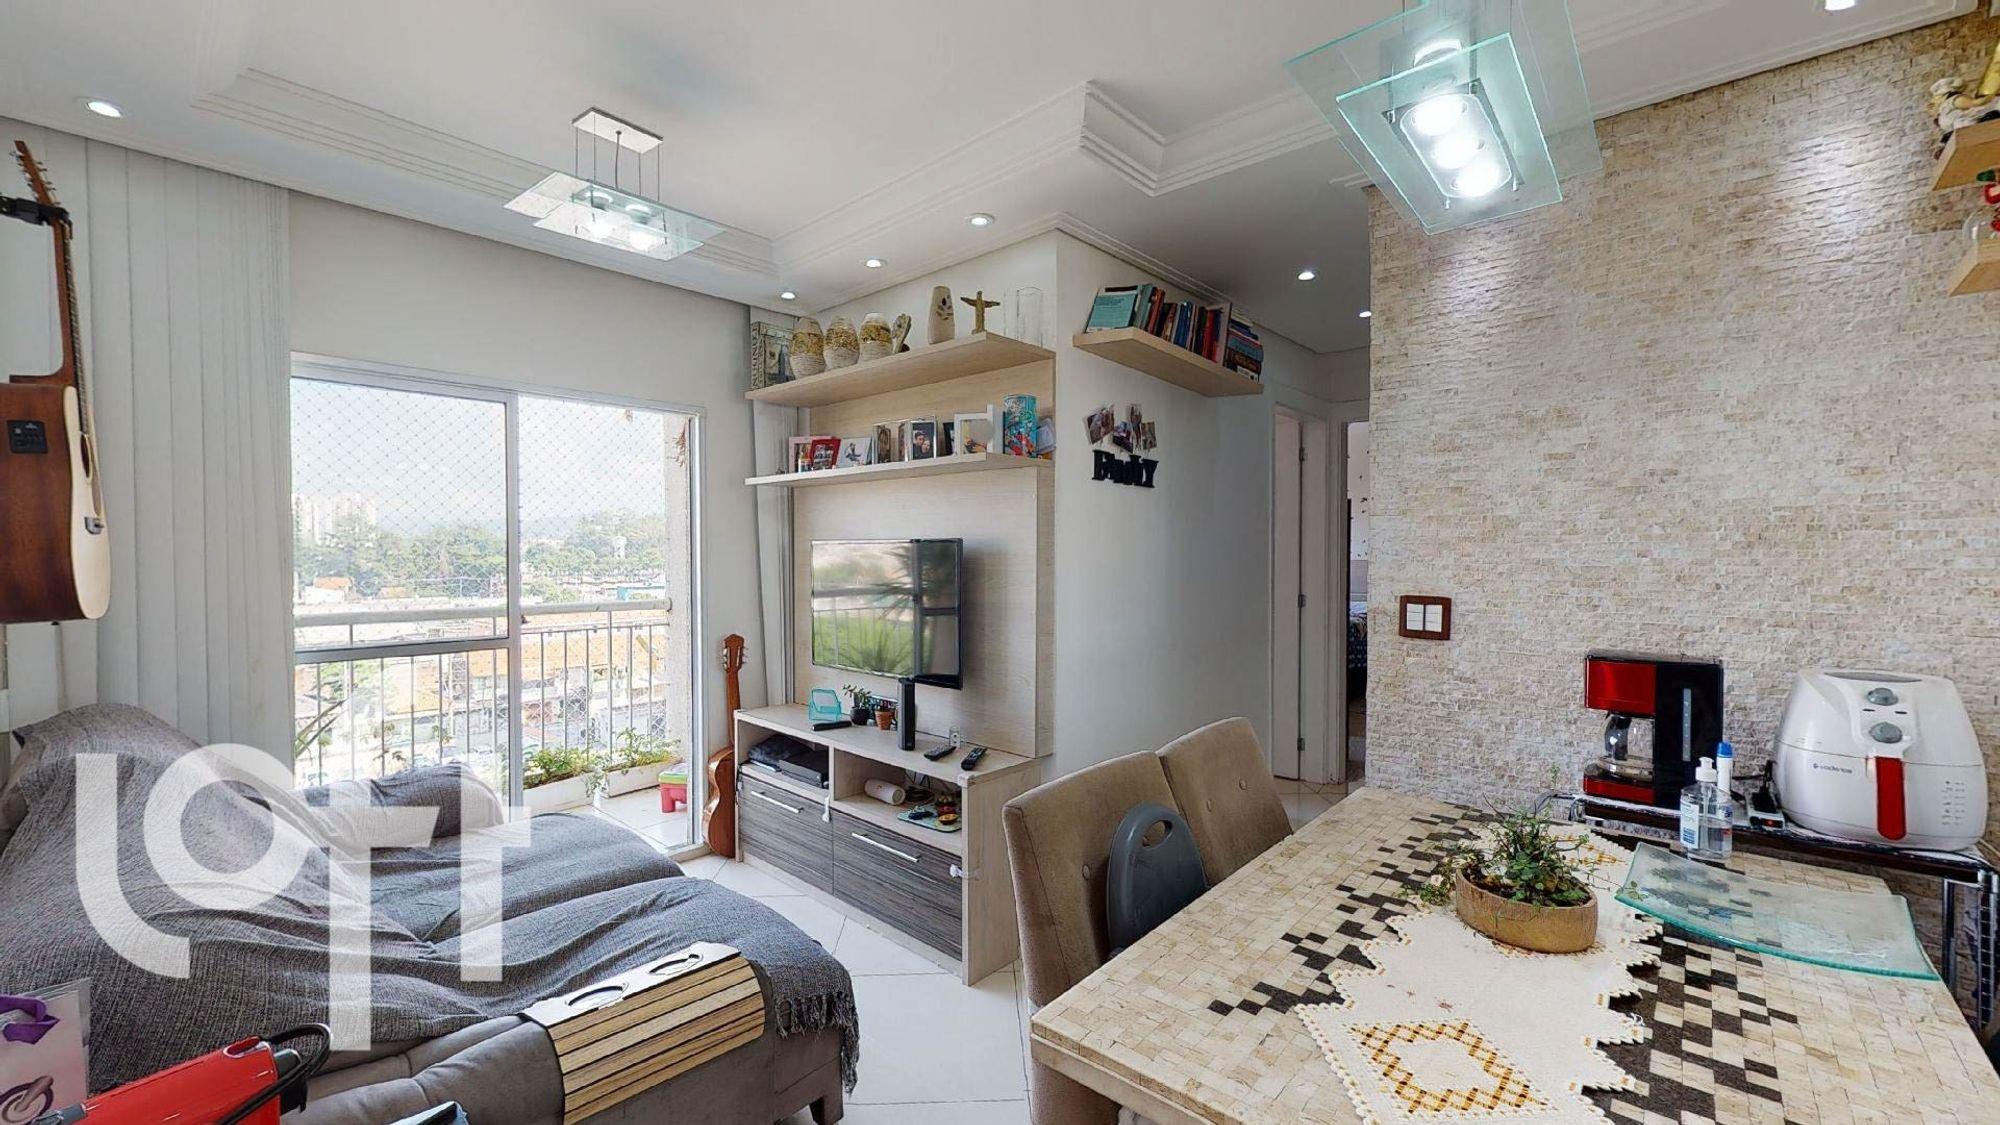 Foto de Sala com vaso de planta, televisão, cadeira, mesa de jantar